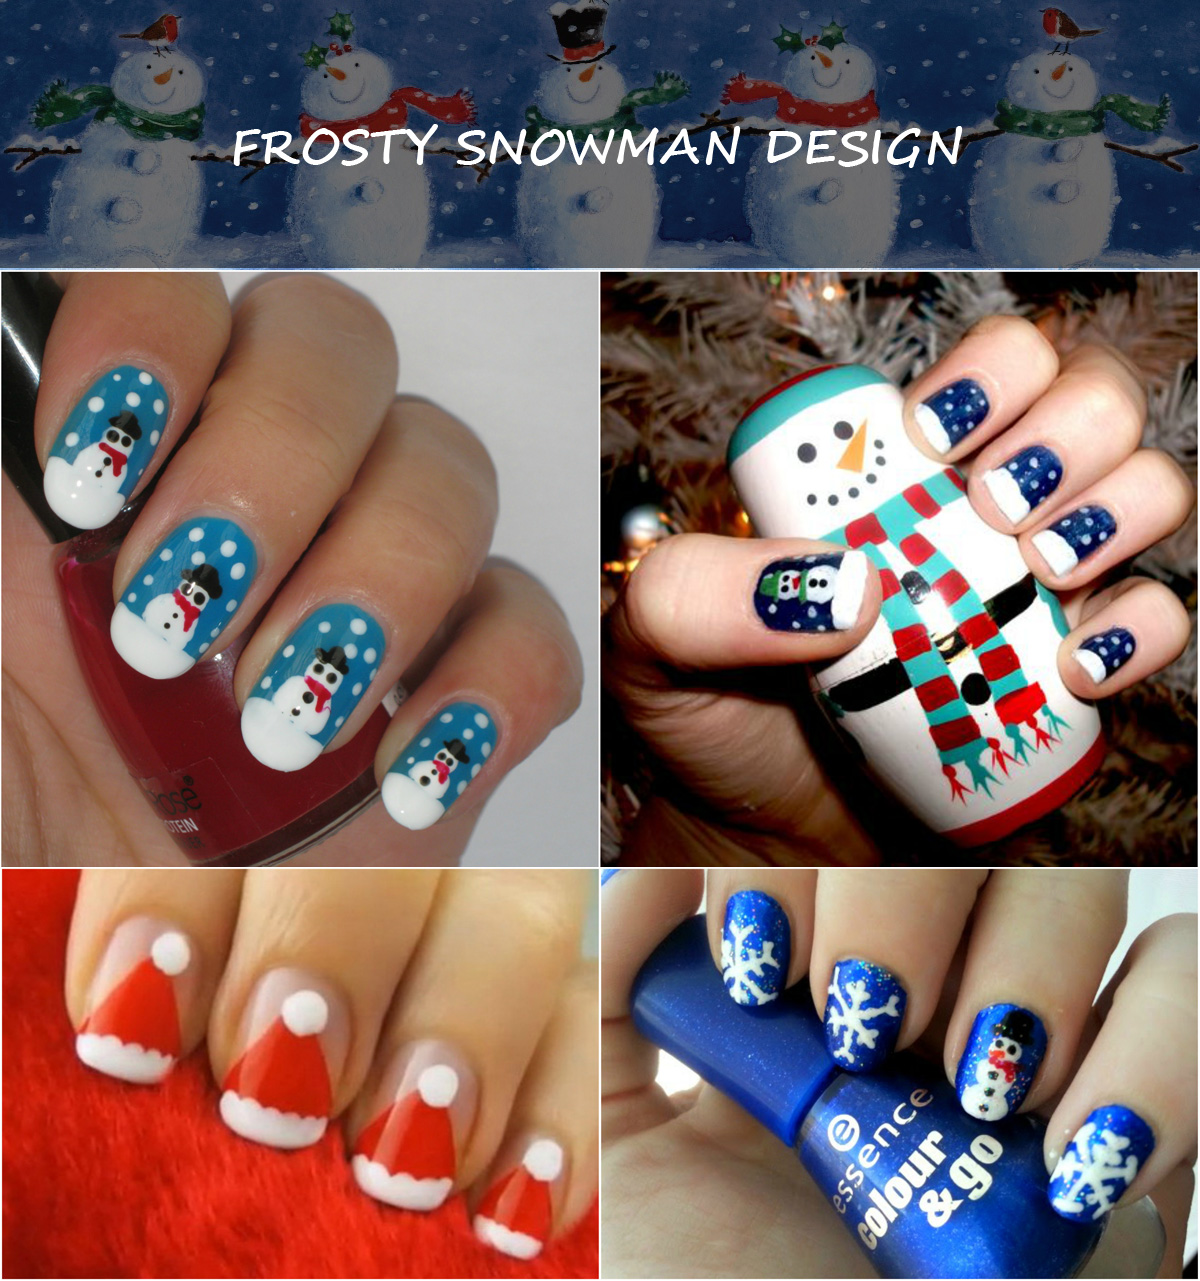 frosty-snowman-design